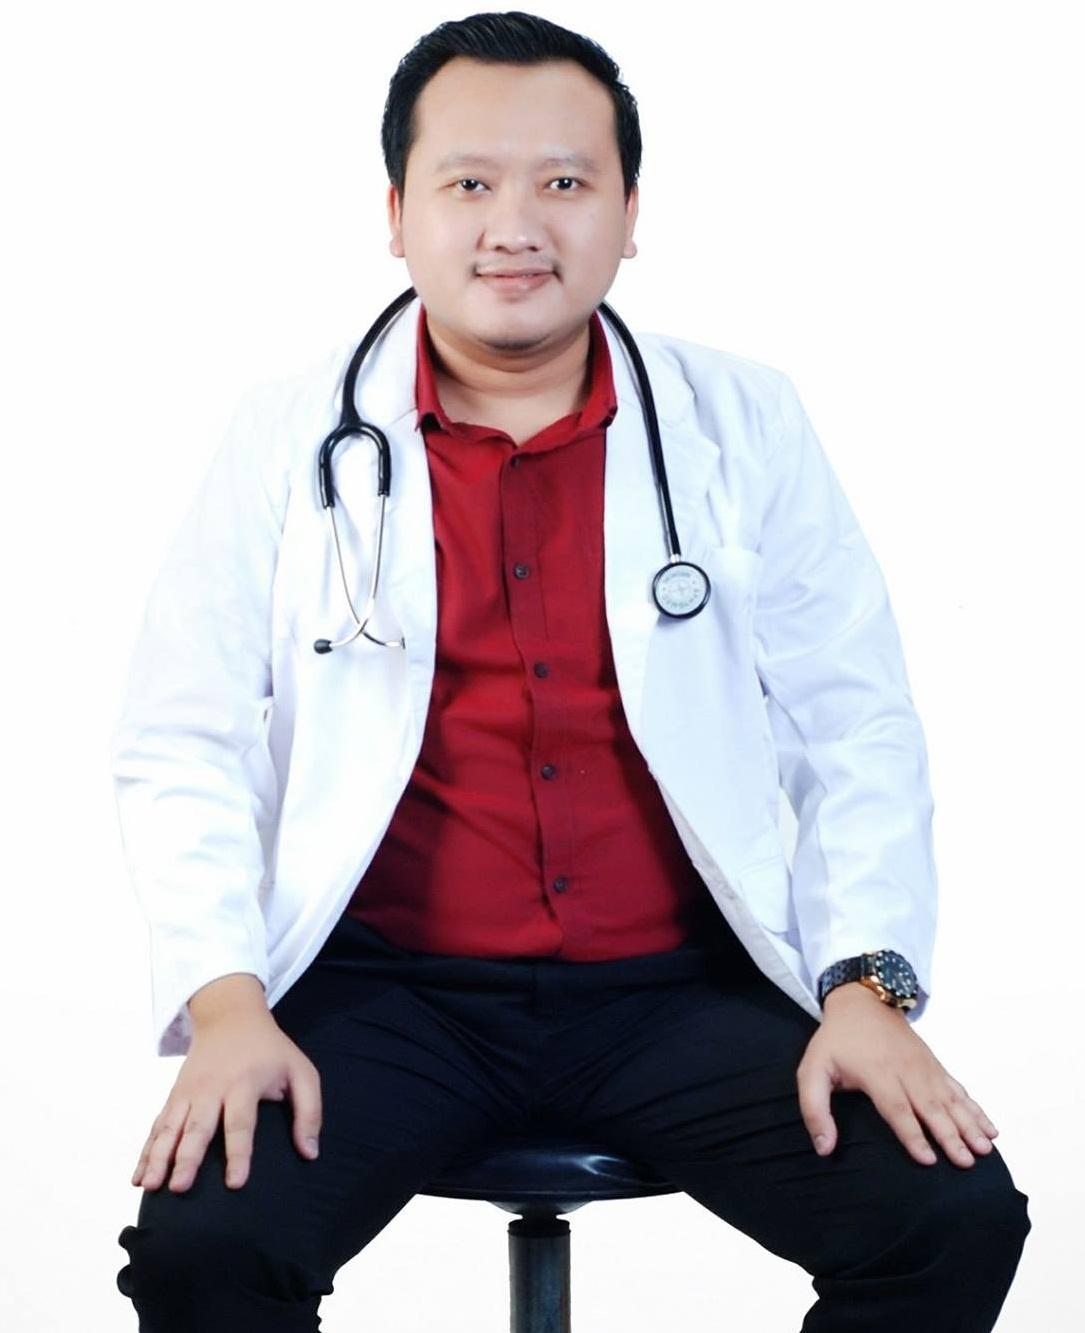 PROFIL DIREKTUR UTAMA   Drh. Alvin Paradiptya, M.Vet